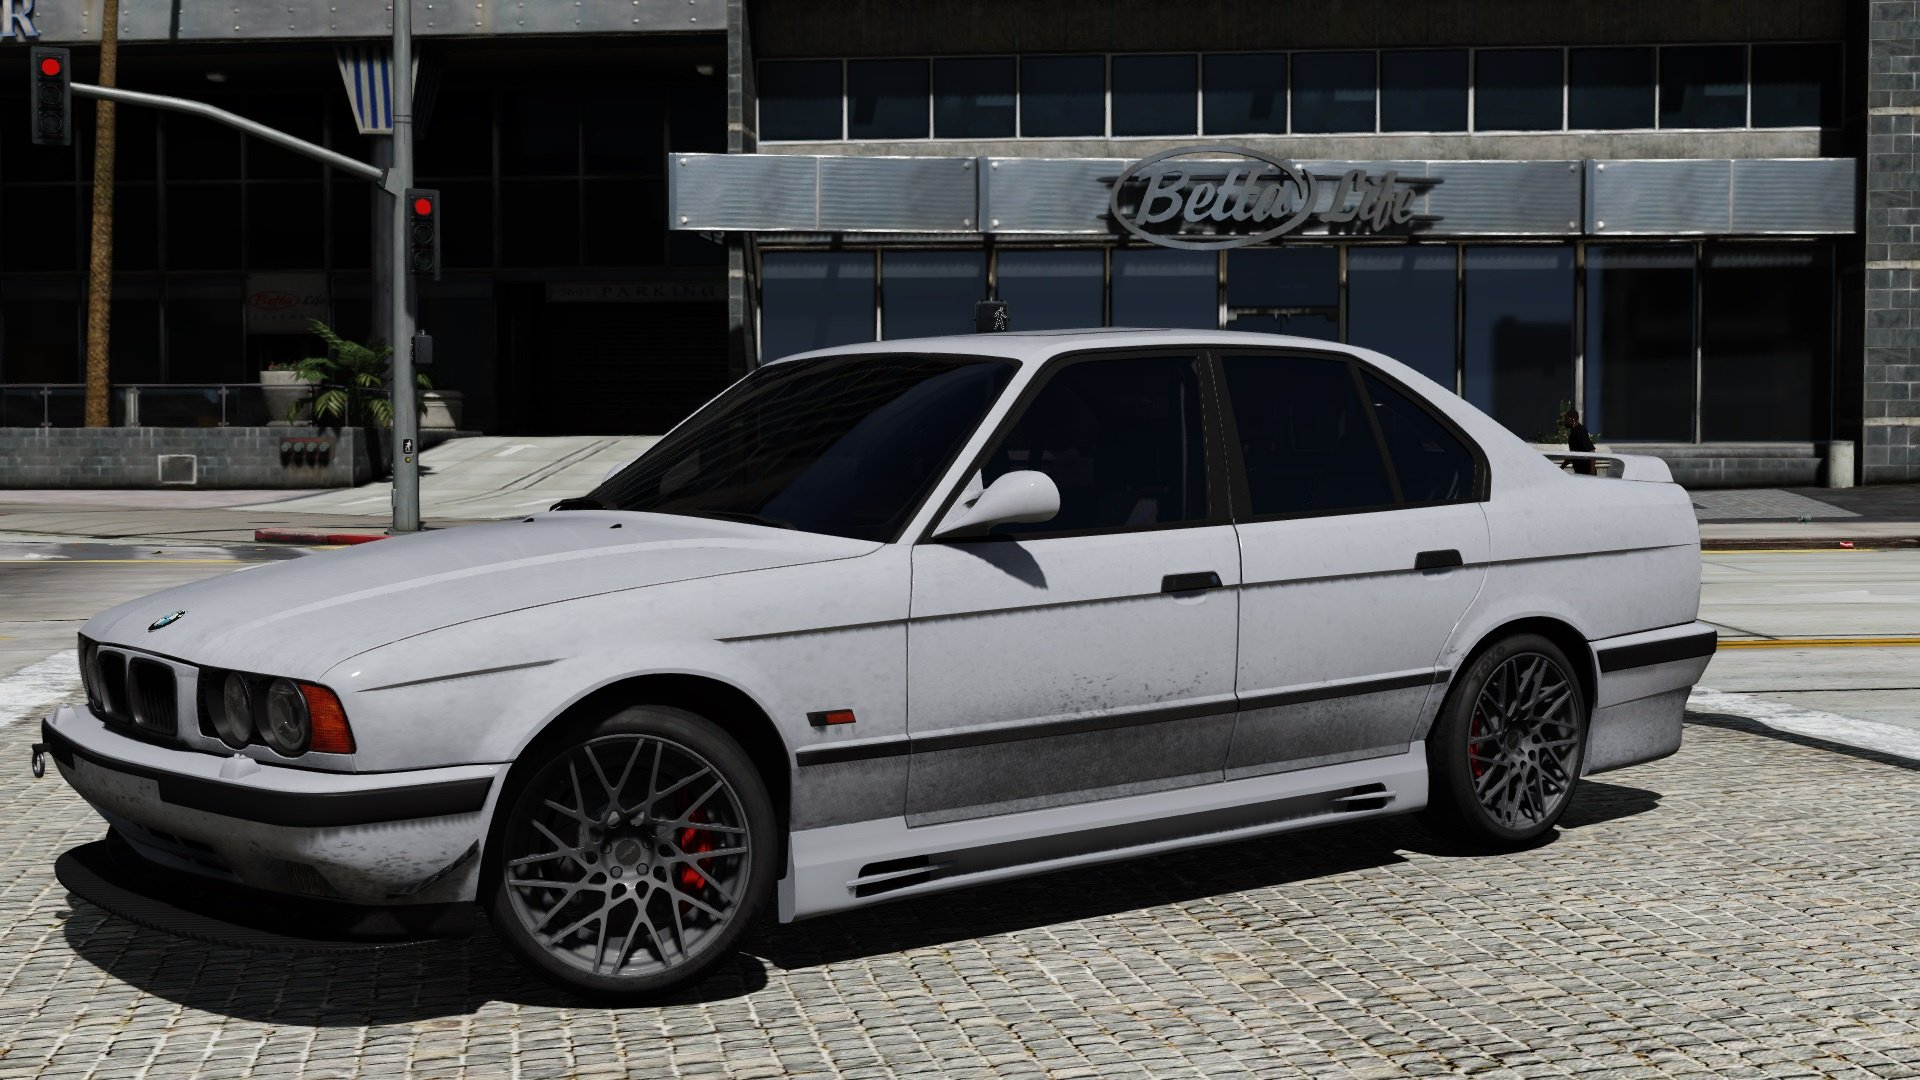 1995 BMW M5 E34 [Add-On / Replace | Tuning] - GTA5-Mods.com